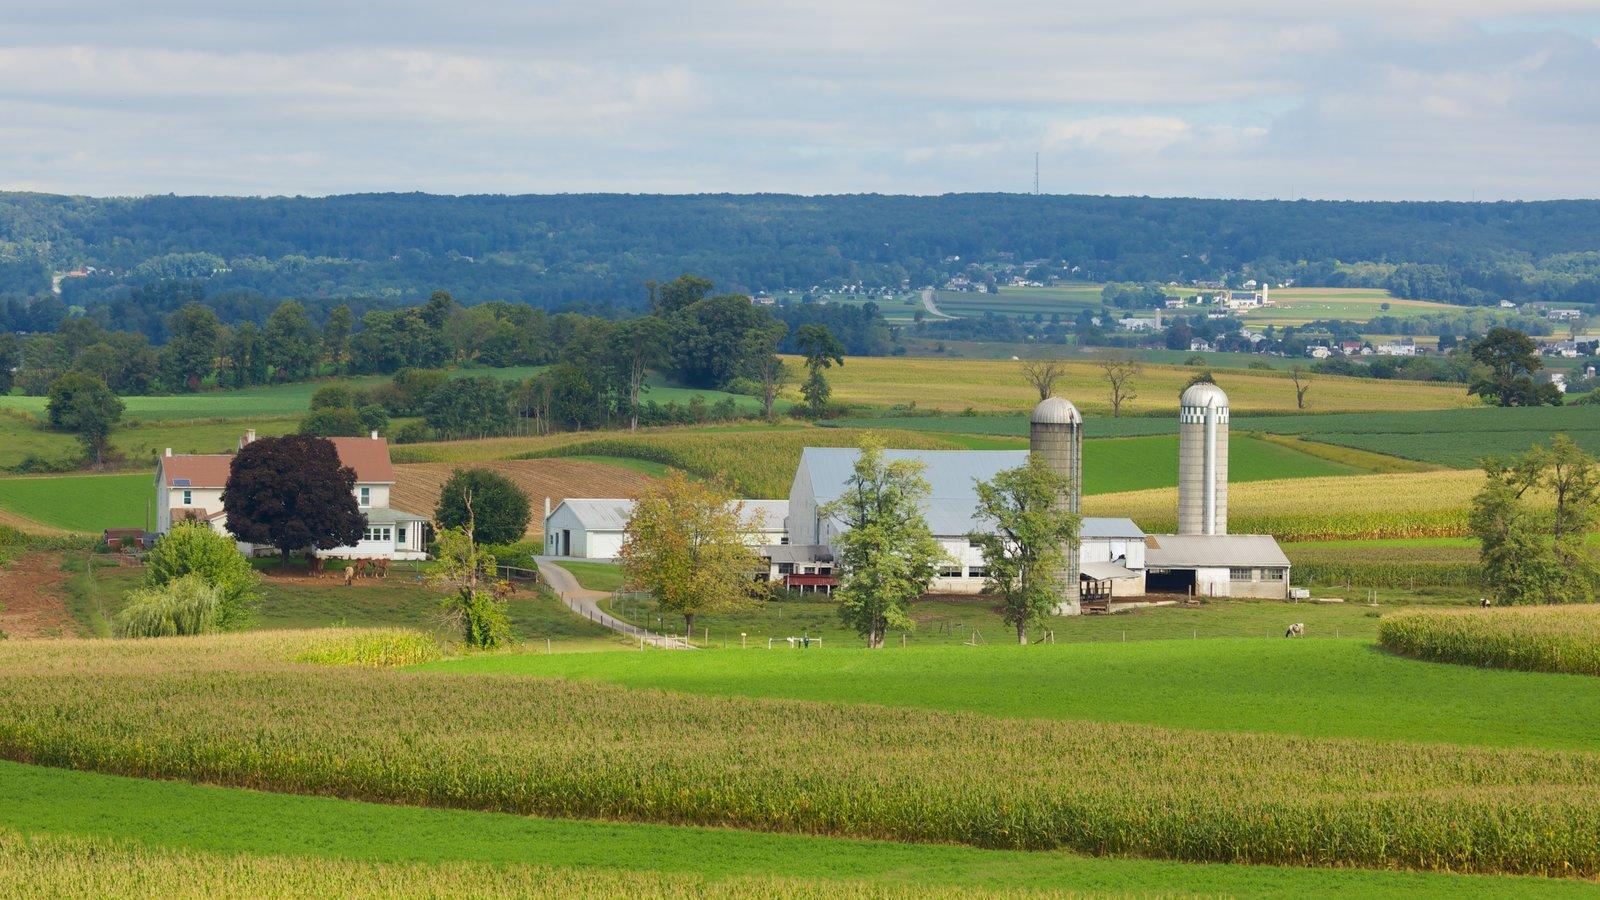 Strasburg which includes farmland and landscape views